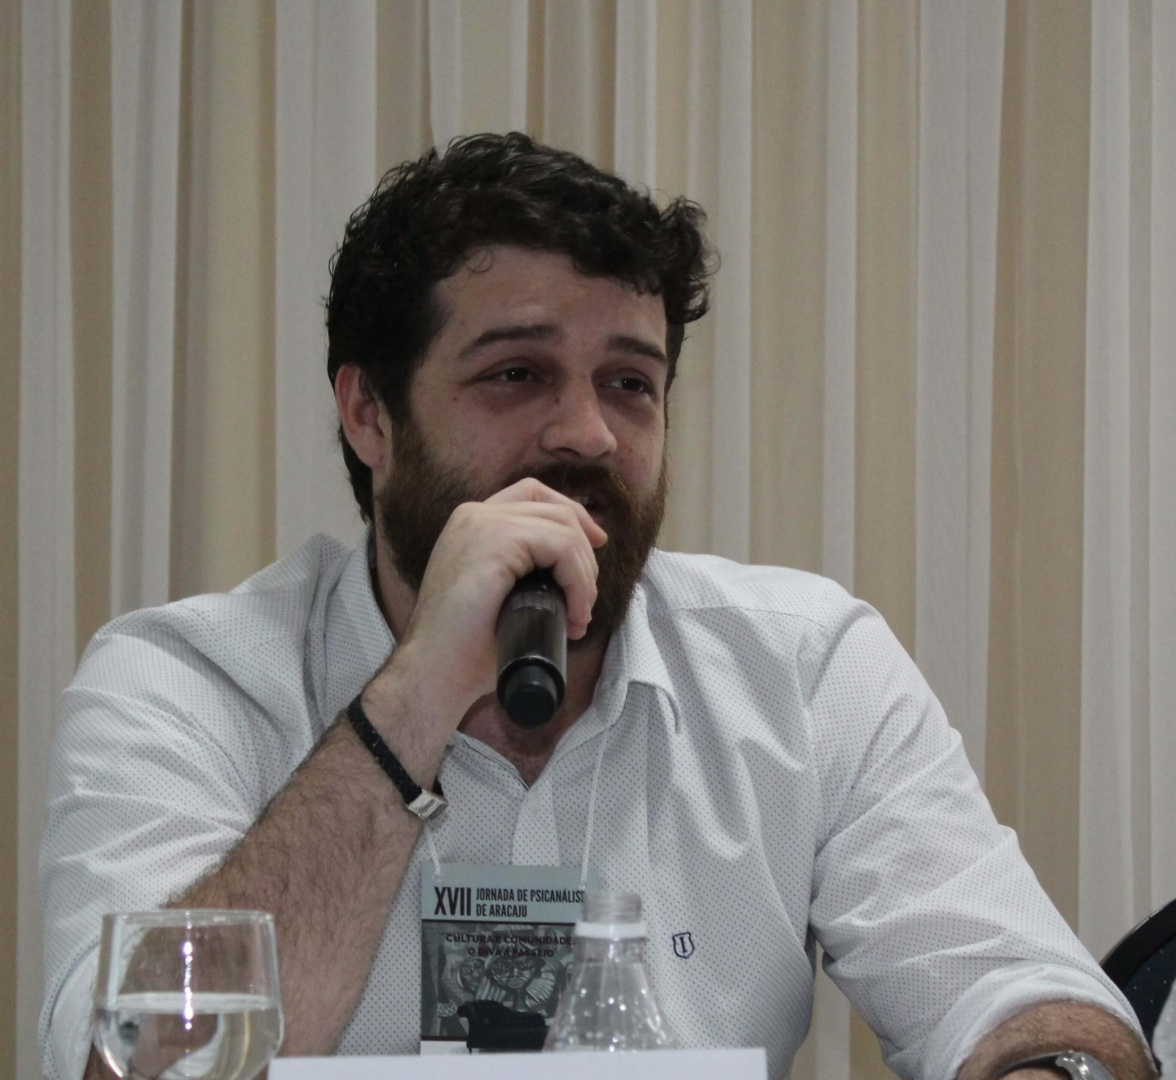 Adalberto A Goulart